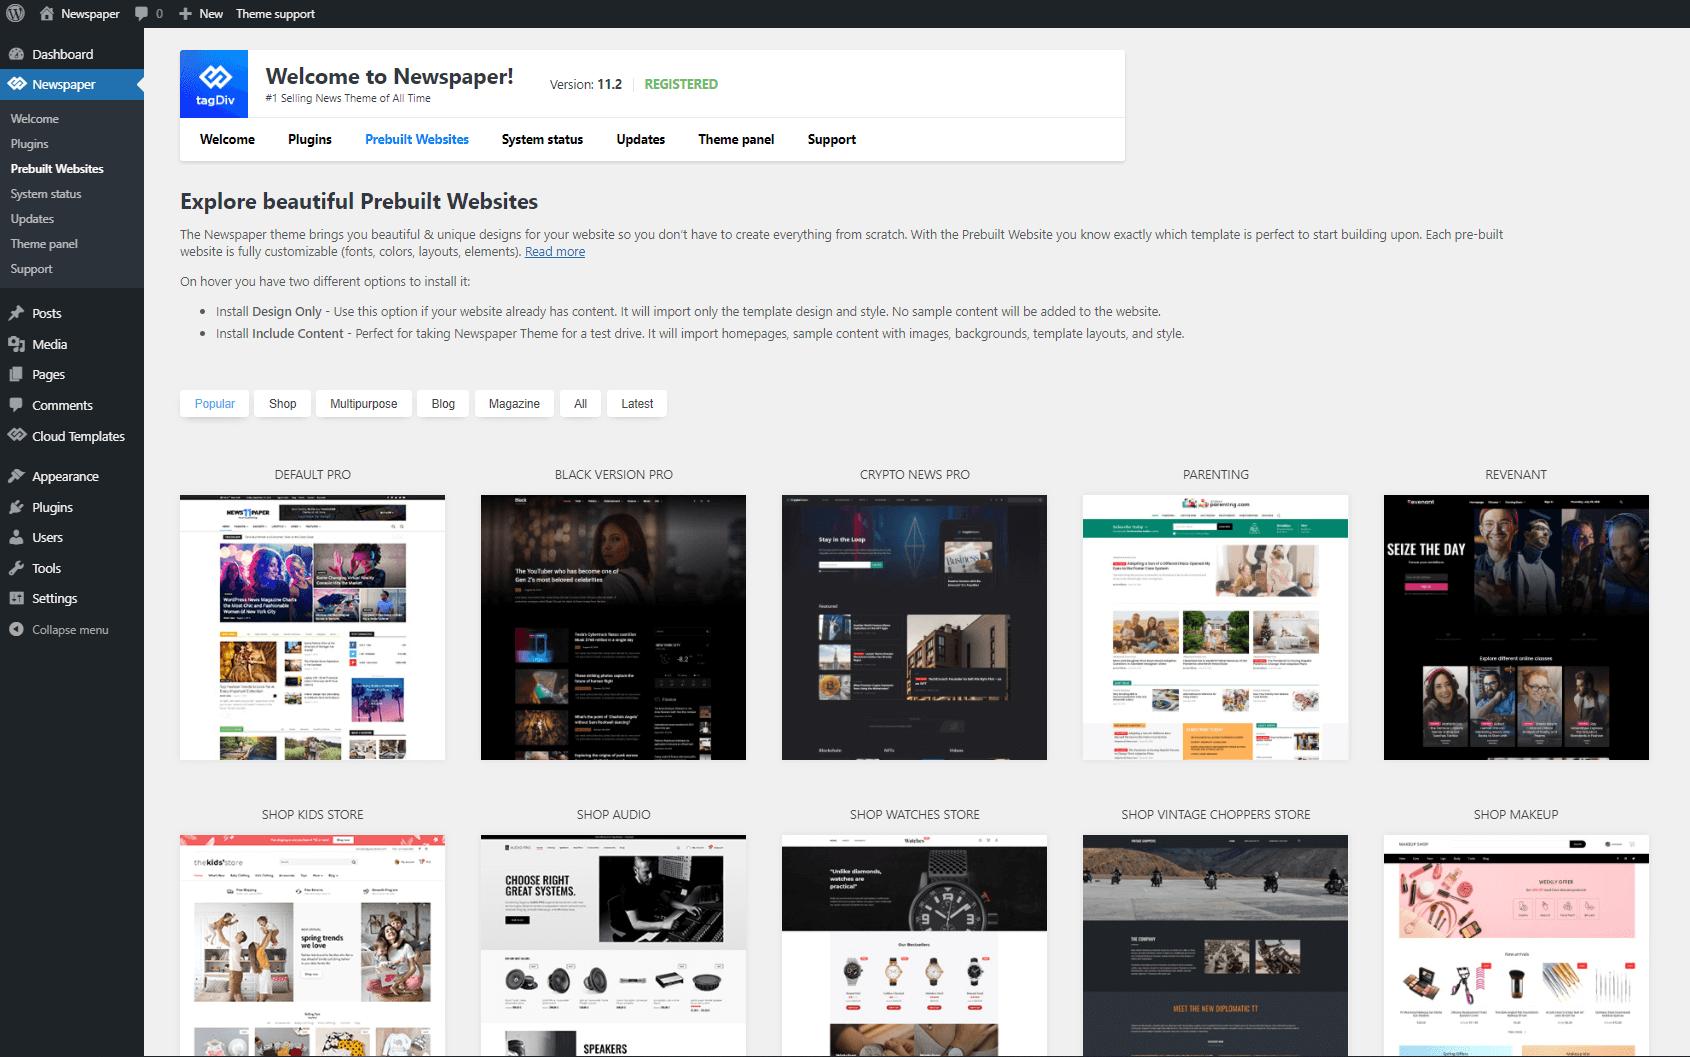 Pre-built Websites - Install Demo